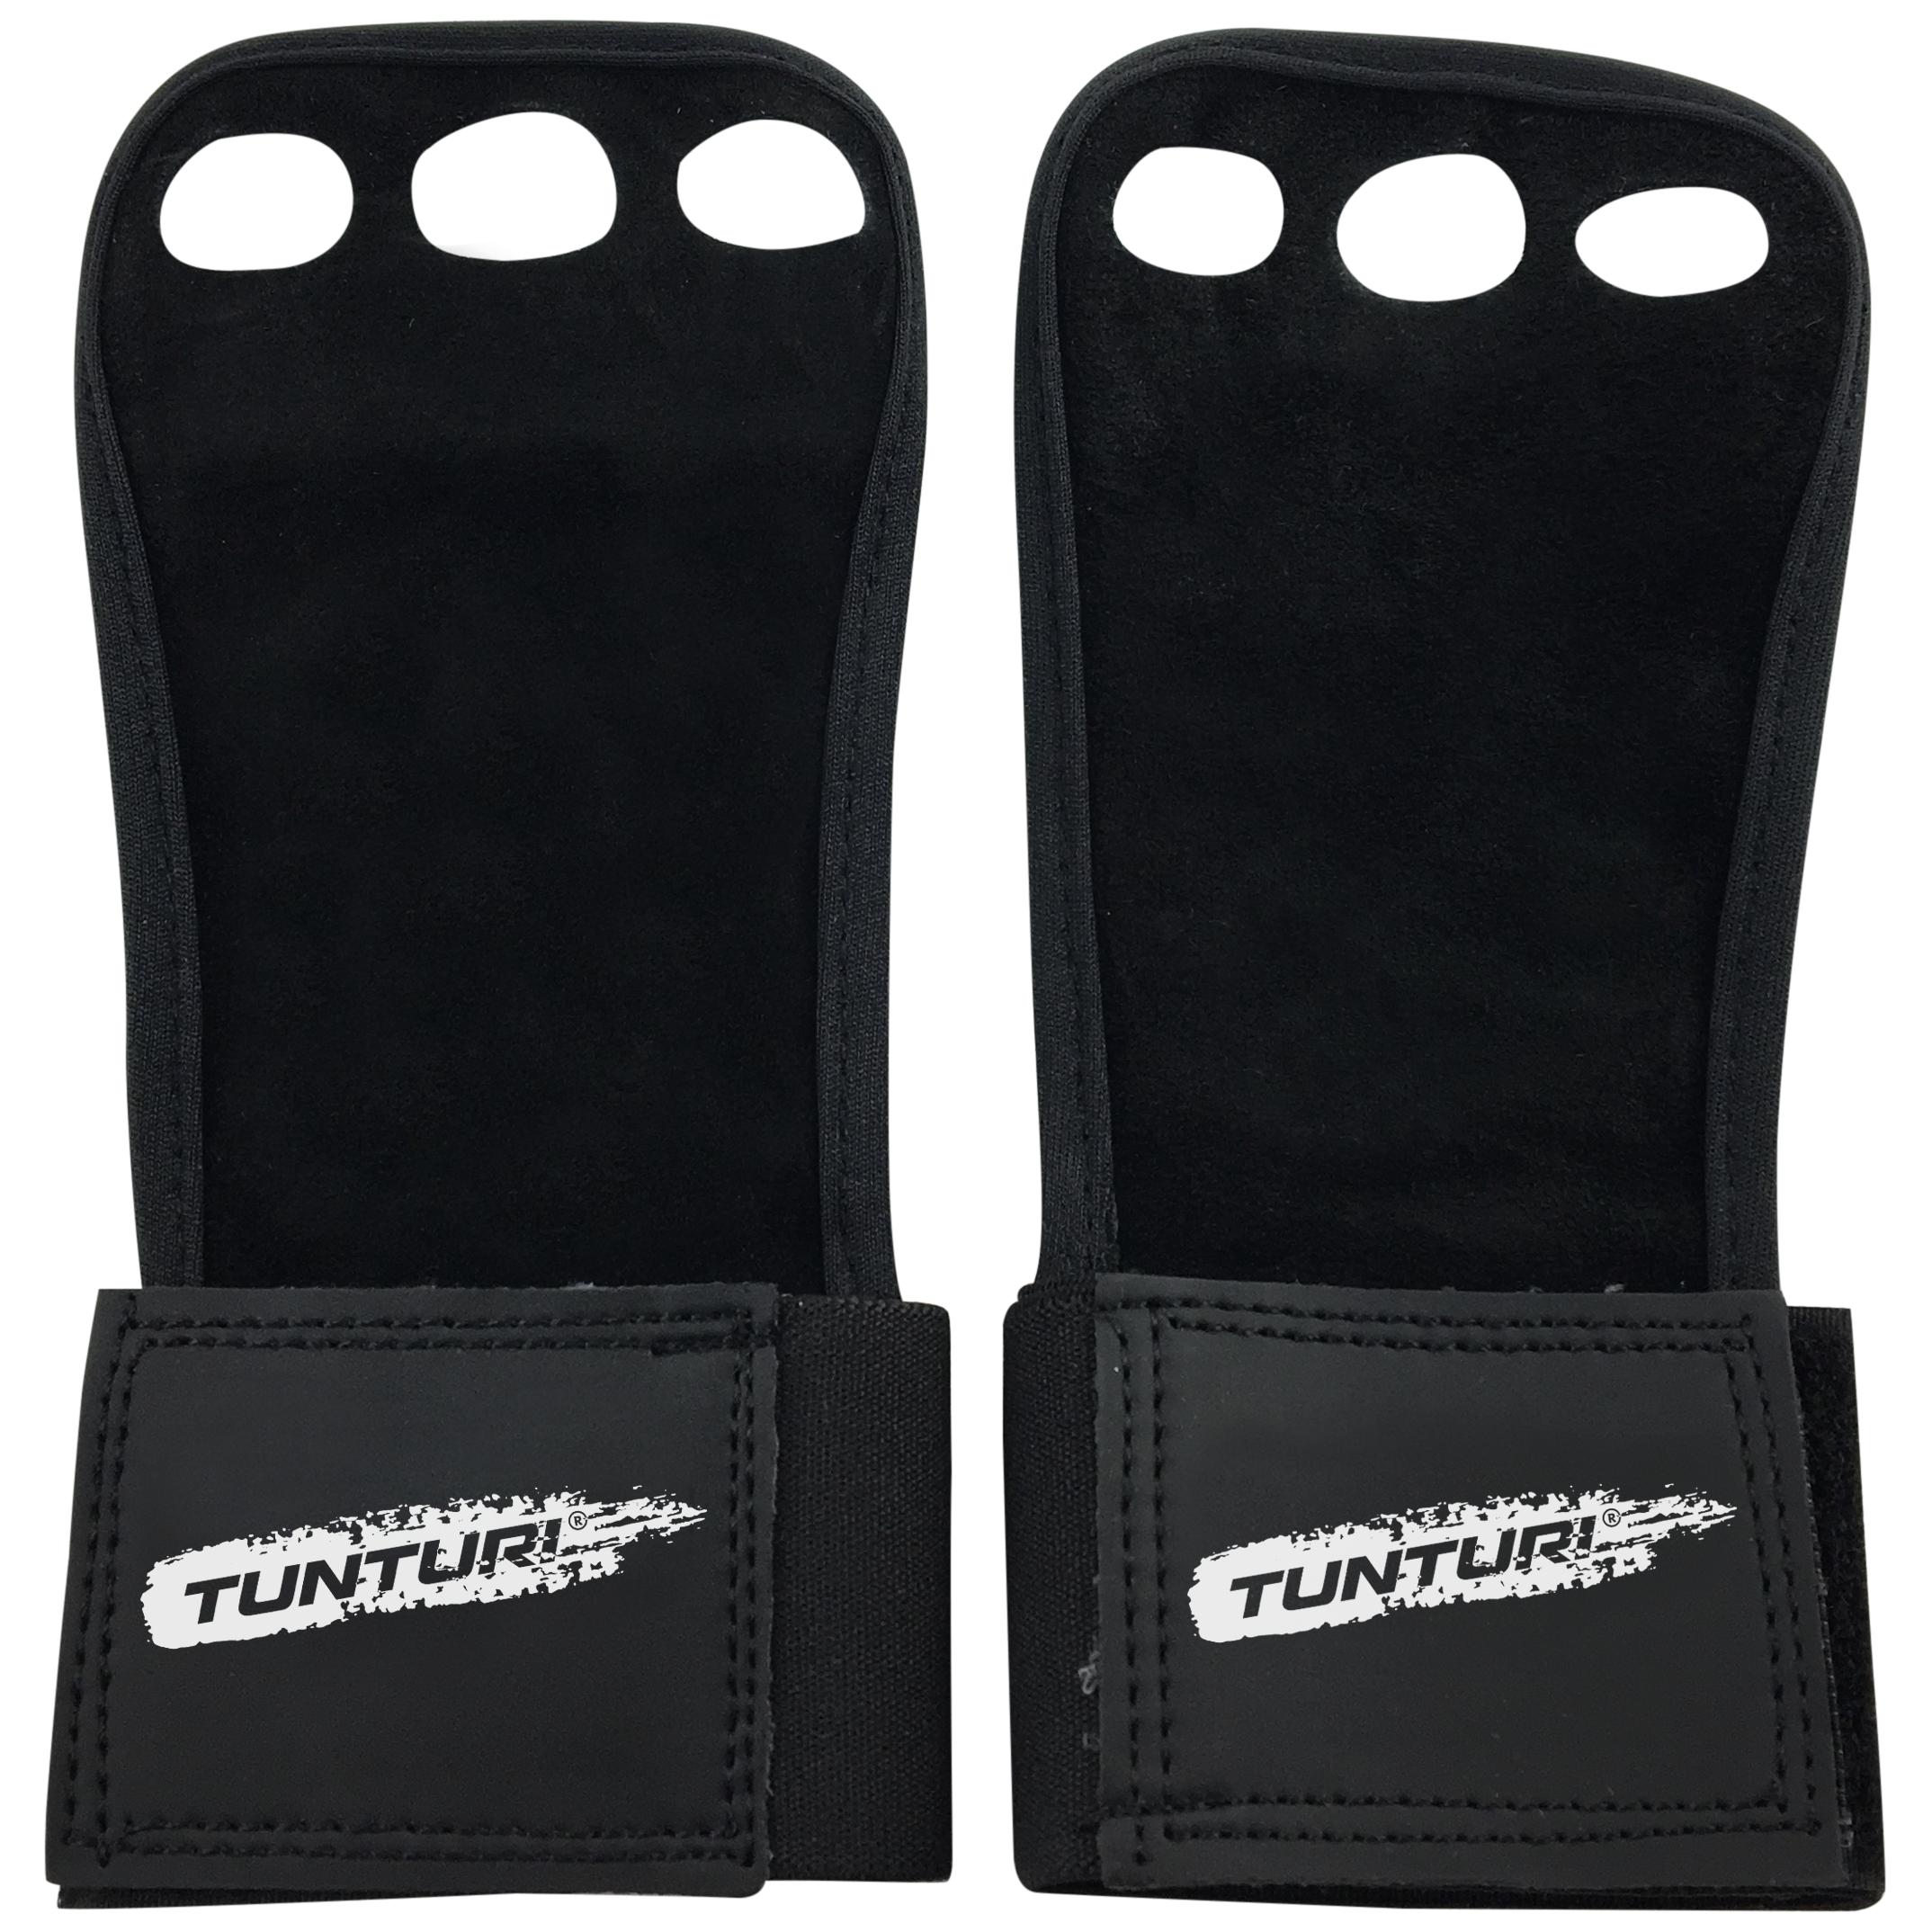 Platinum Pro Cross Fit Grips Leather